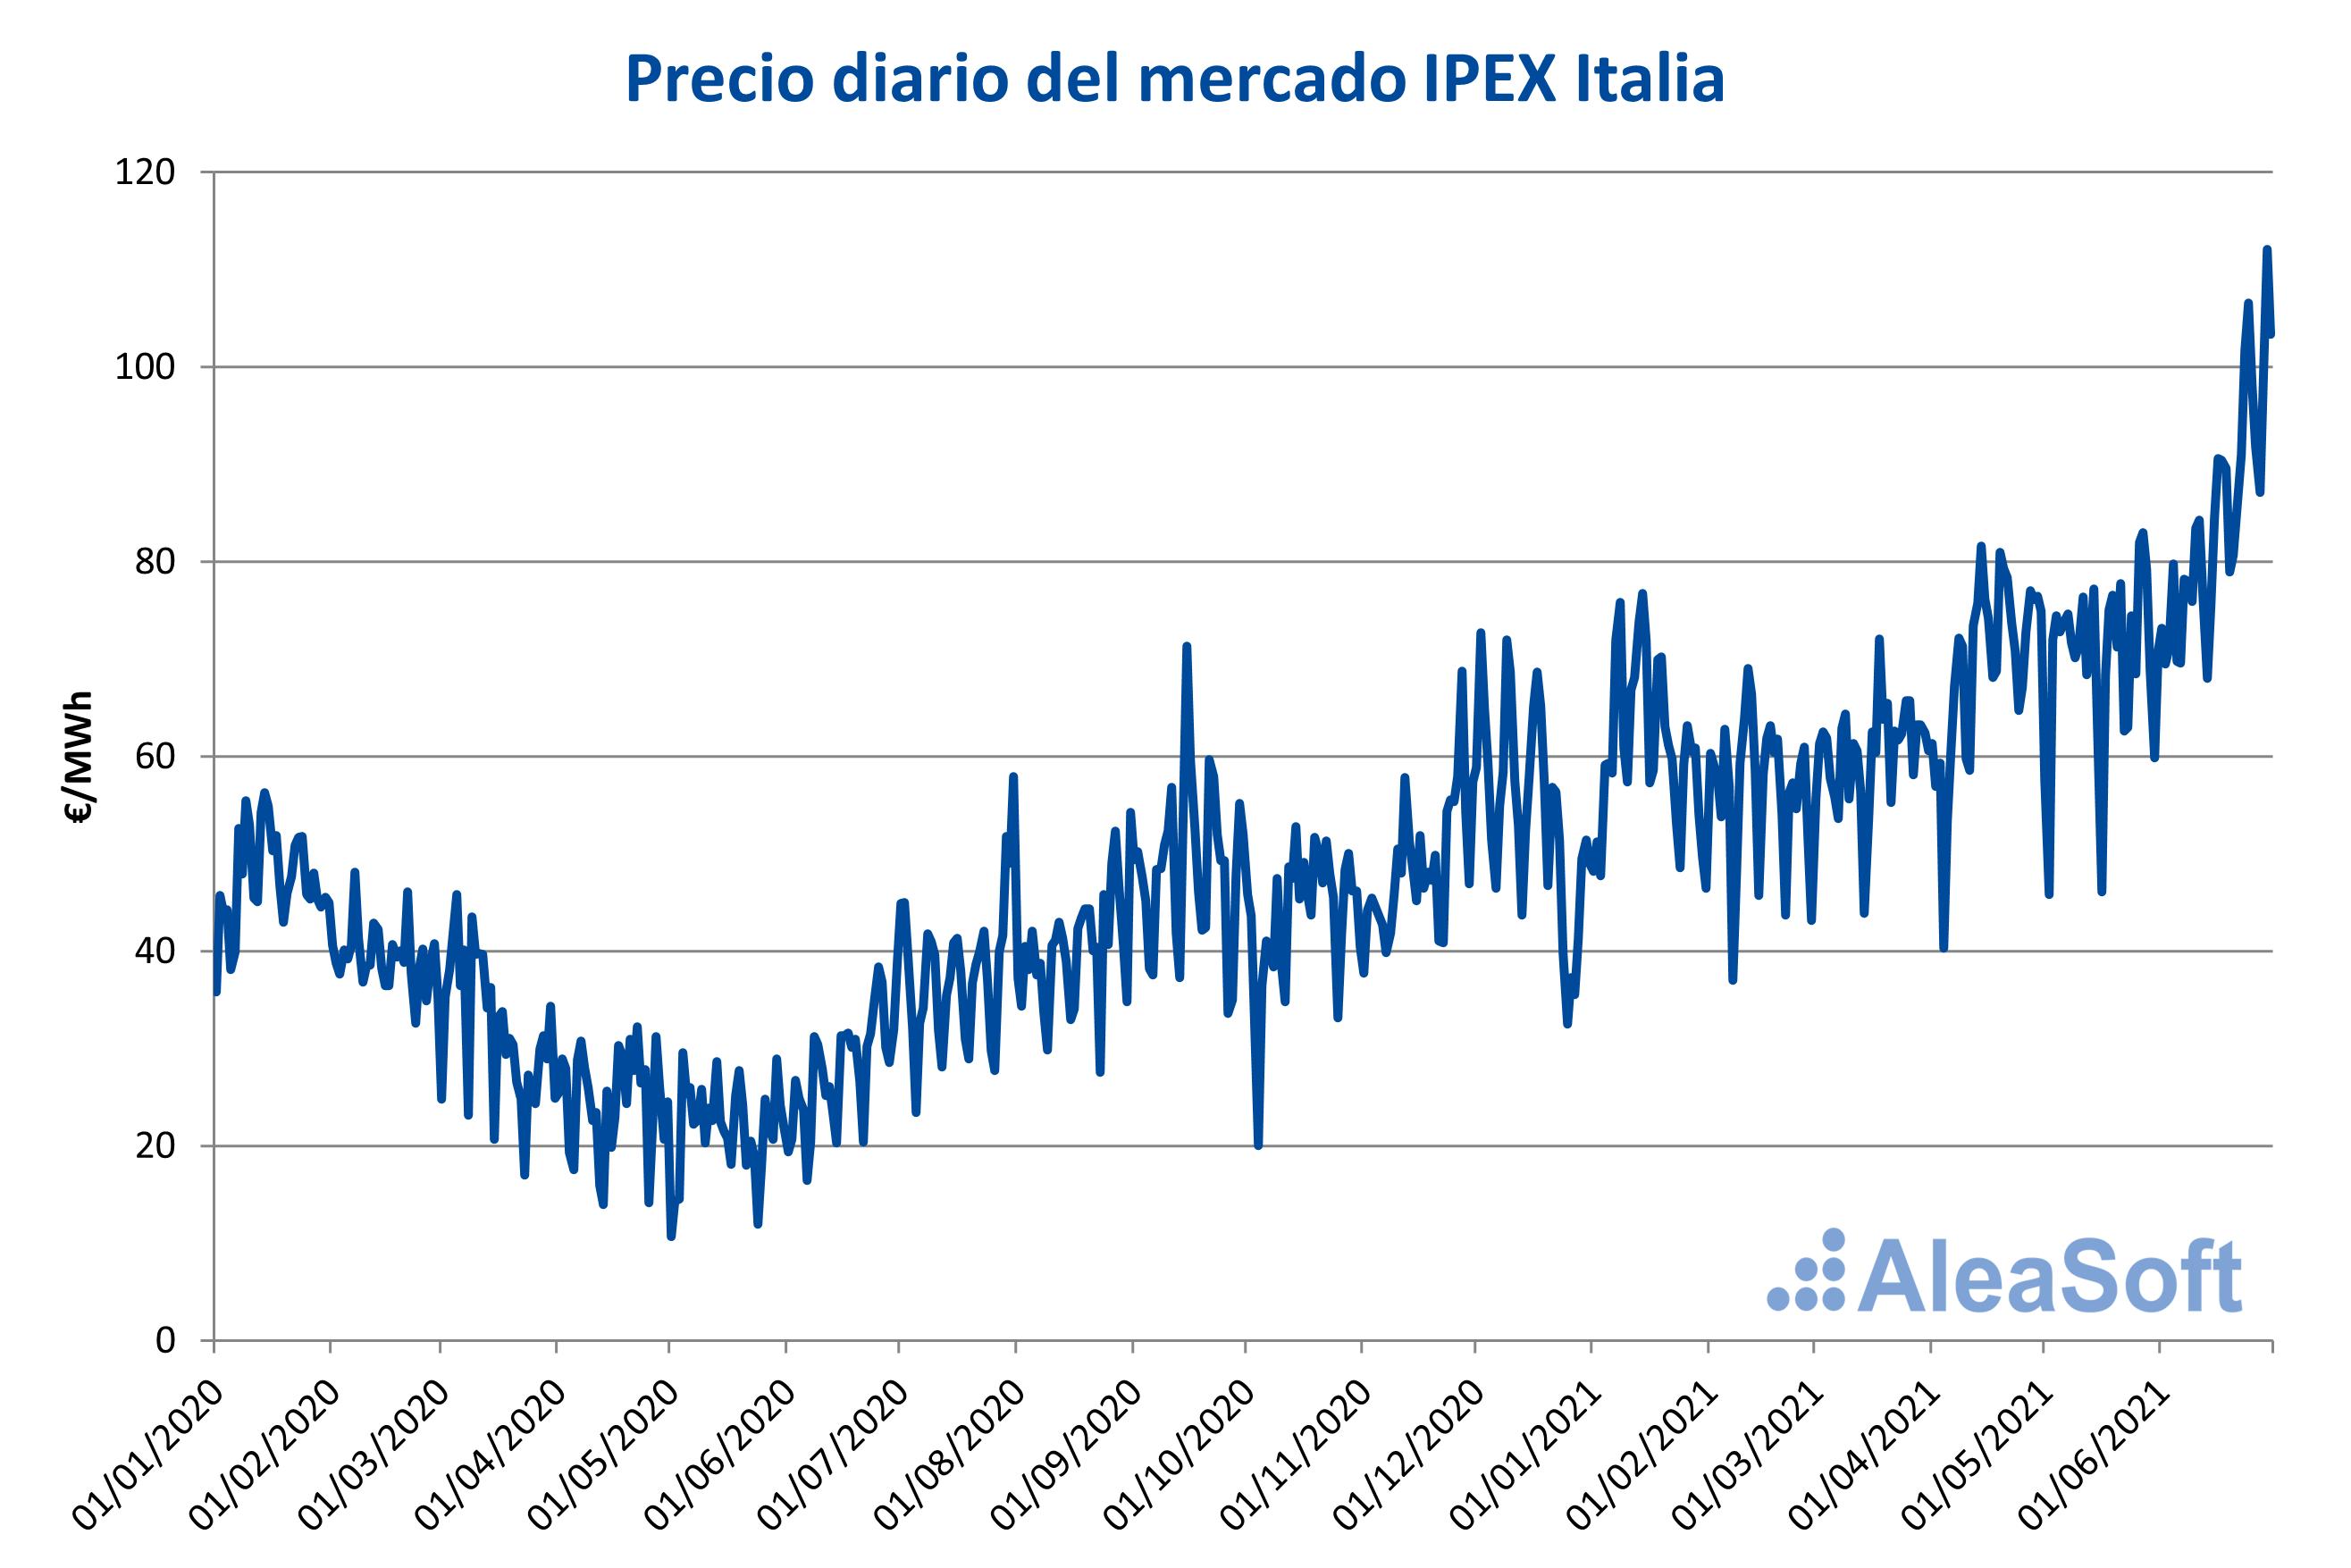 AleaSoft - precio diario mercado ipex italia